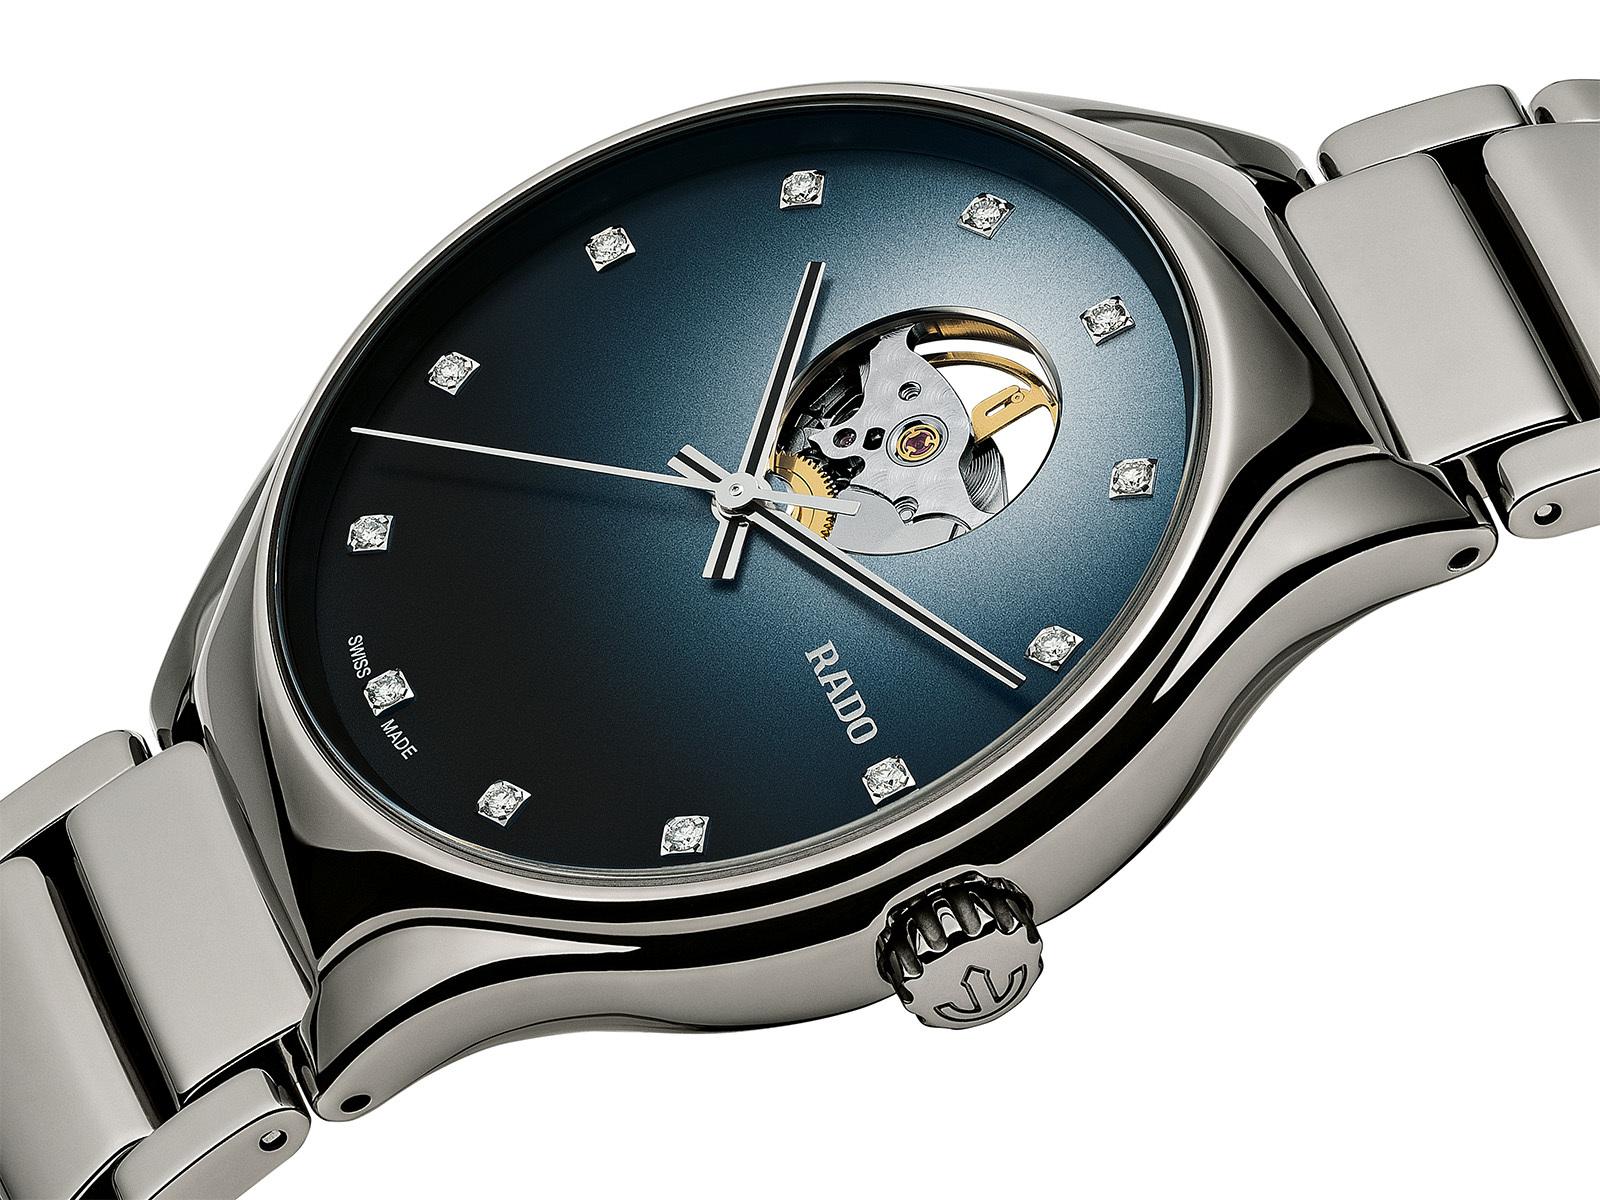 【RADO ラドー】True Secret Diamondsトゥルーシークレットダイヤモンズ(ブルー)/国内正規品 腕時計